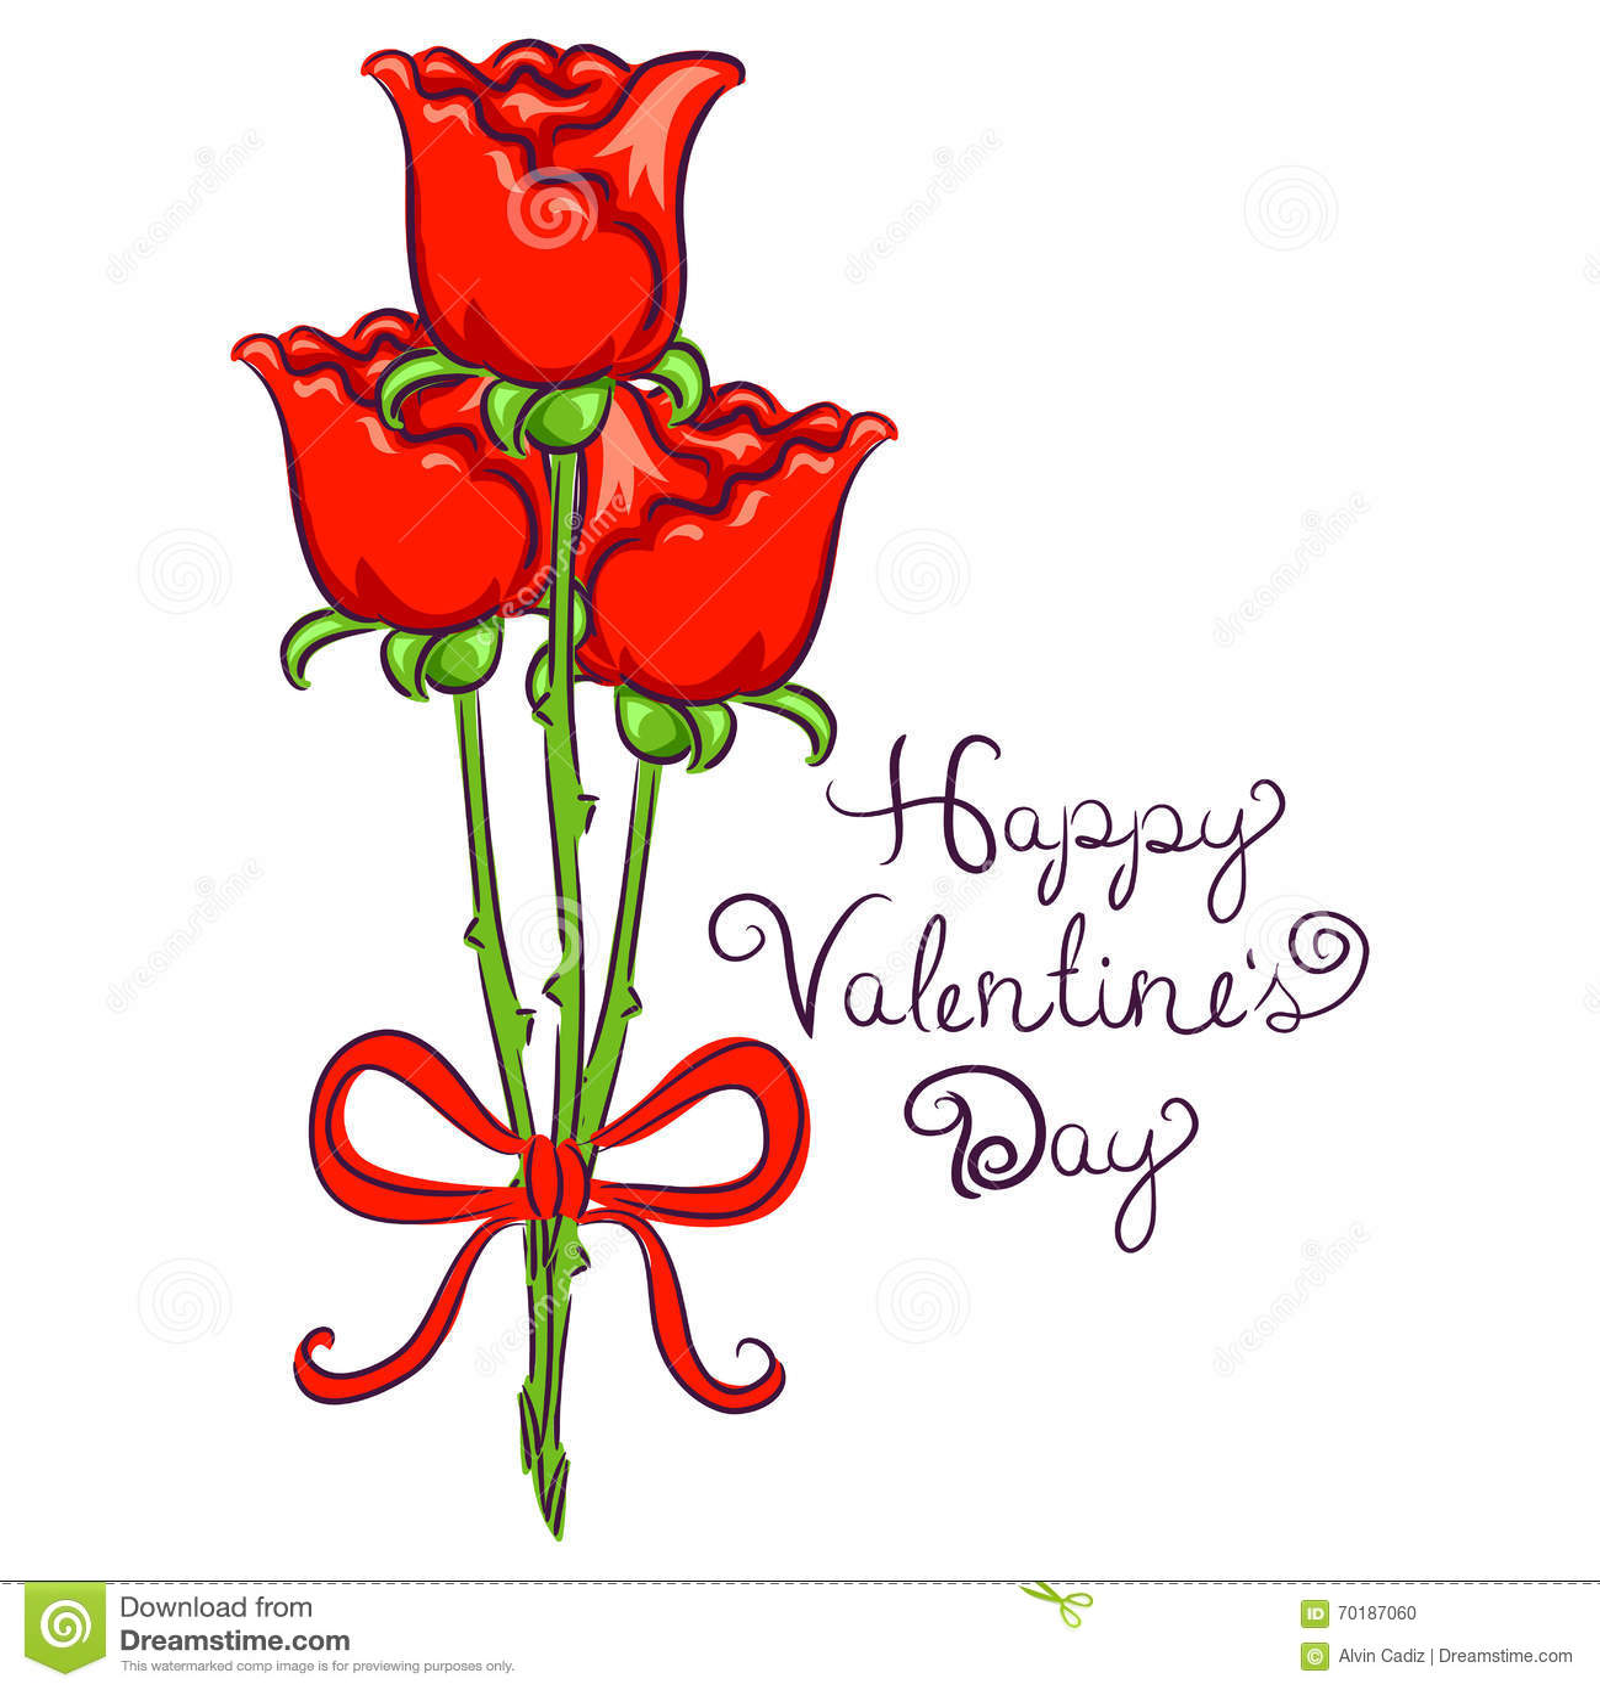 Valentindagbakgrund med rosen som binds i band